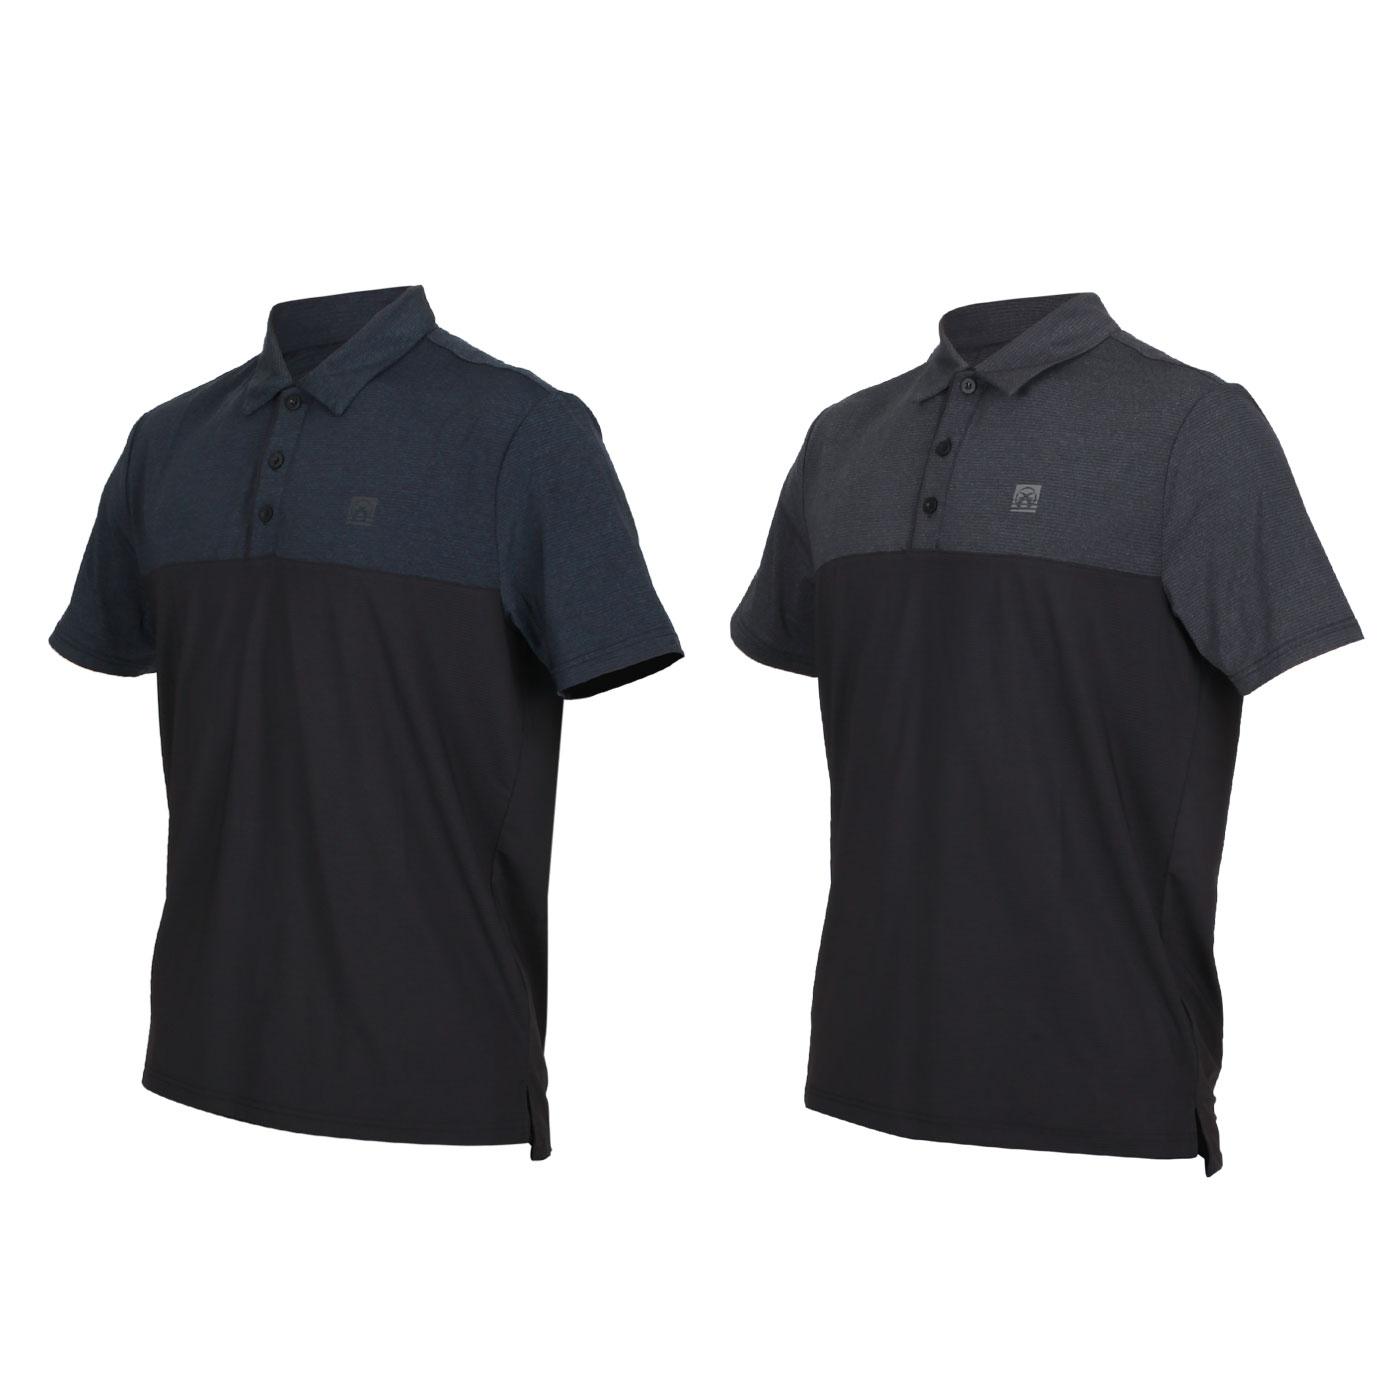 FIRESTAR 男款彈性剪接短袖POLO衫 D0553-18